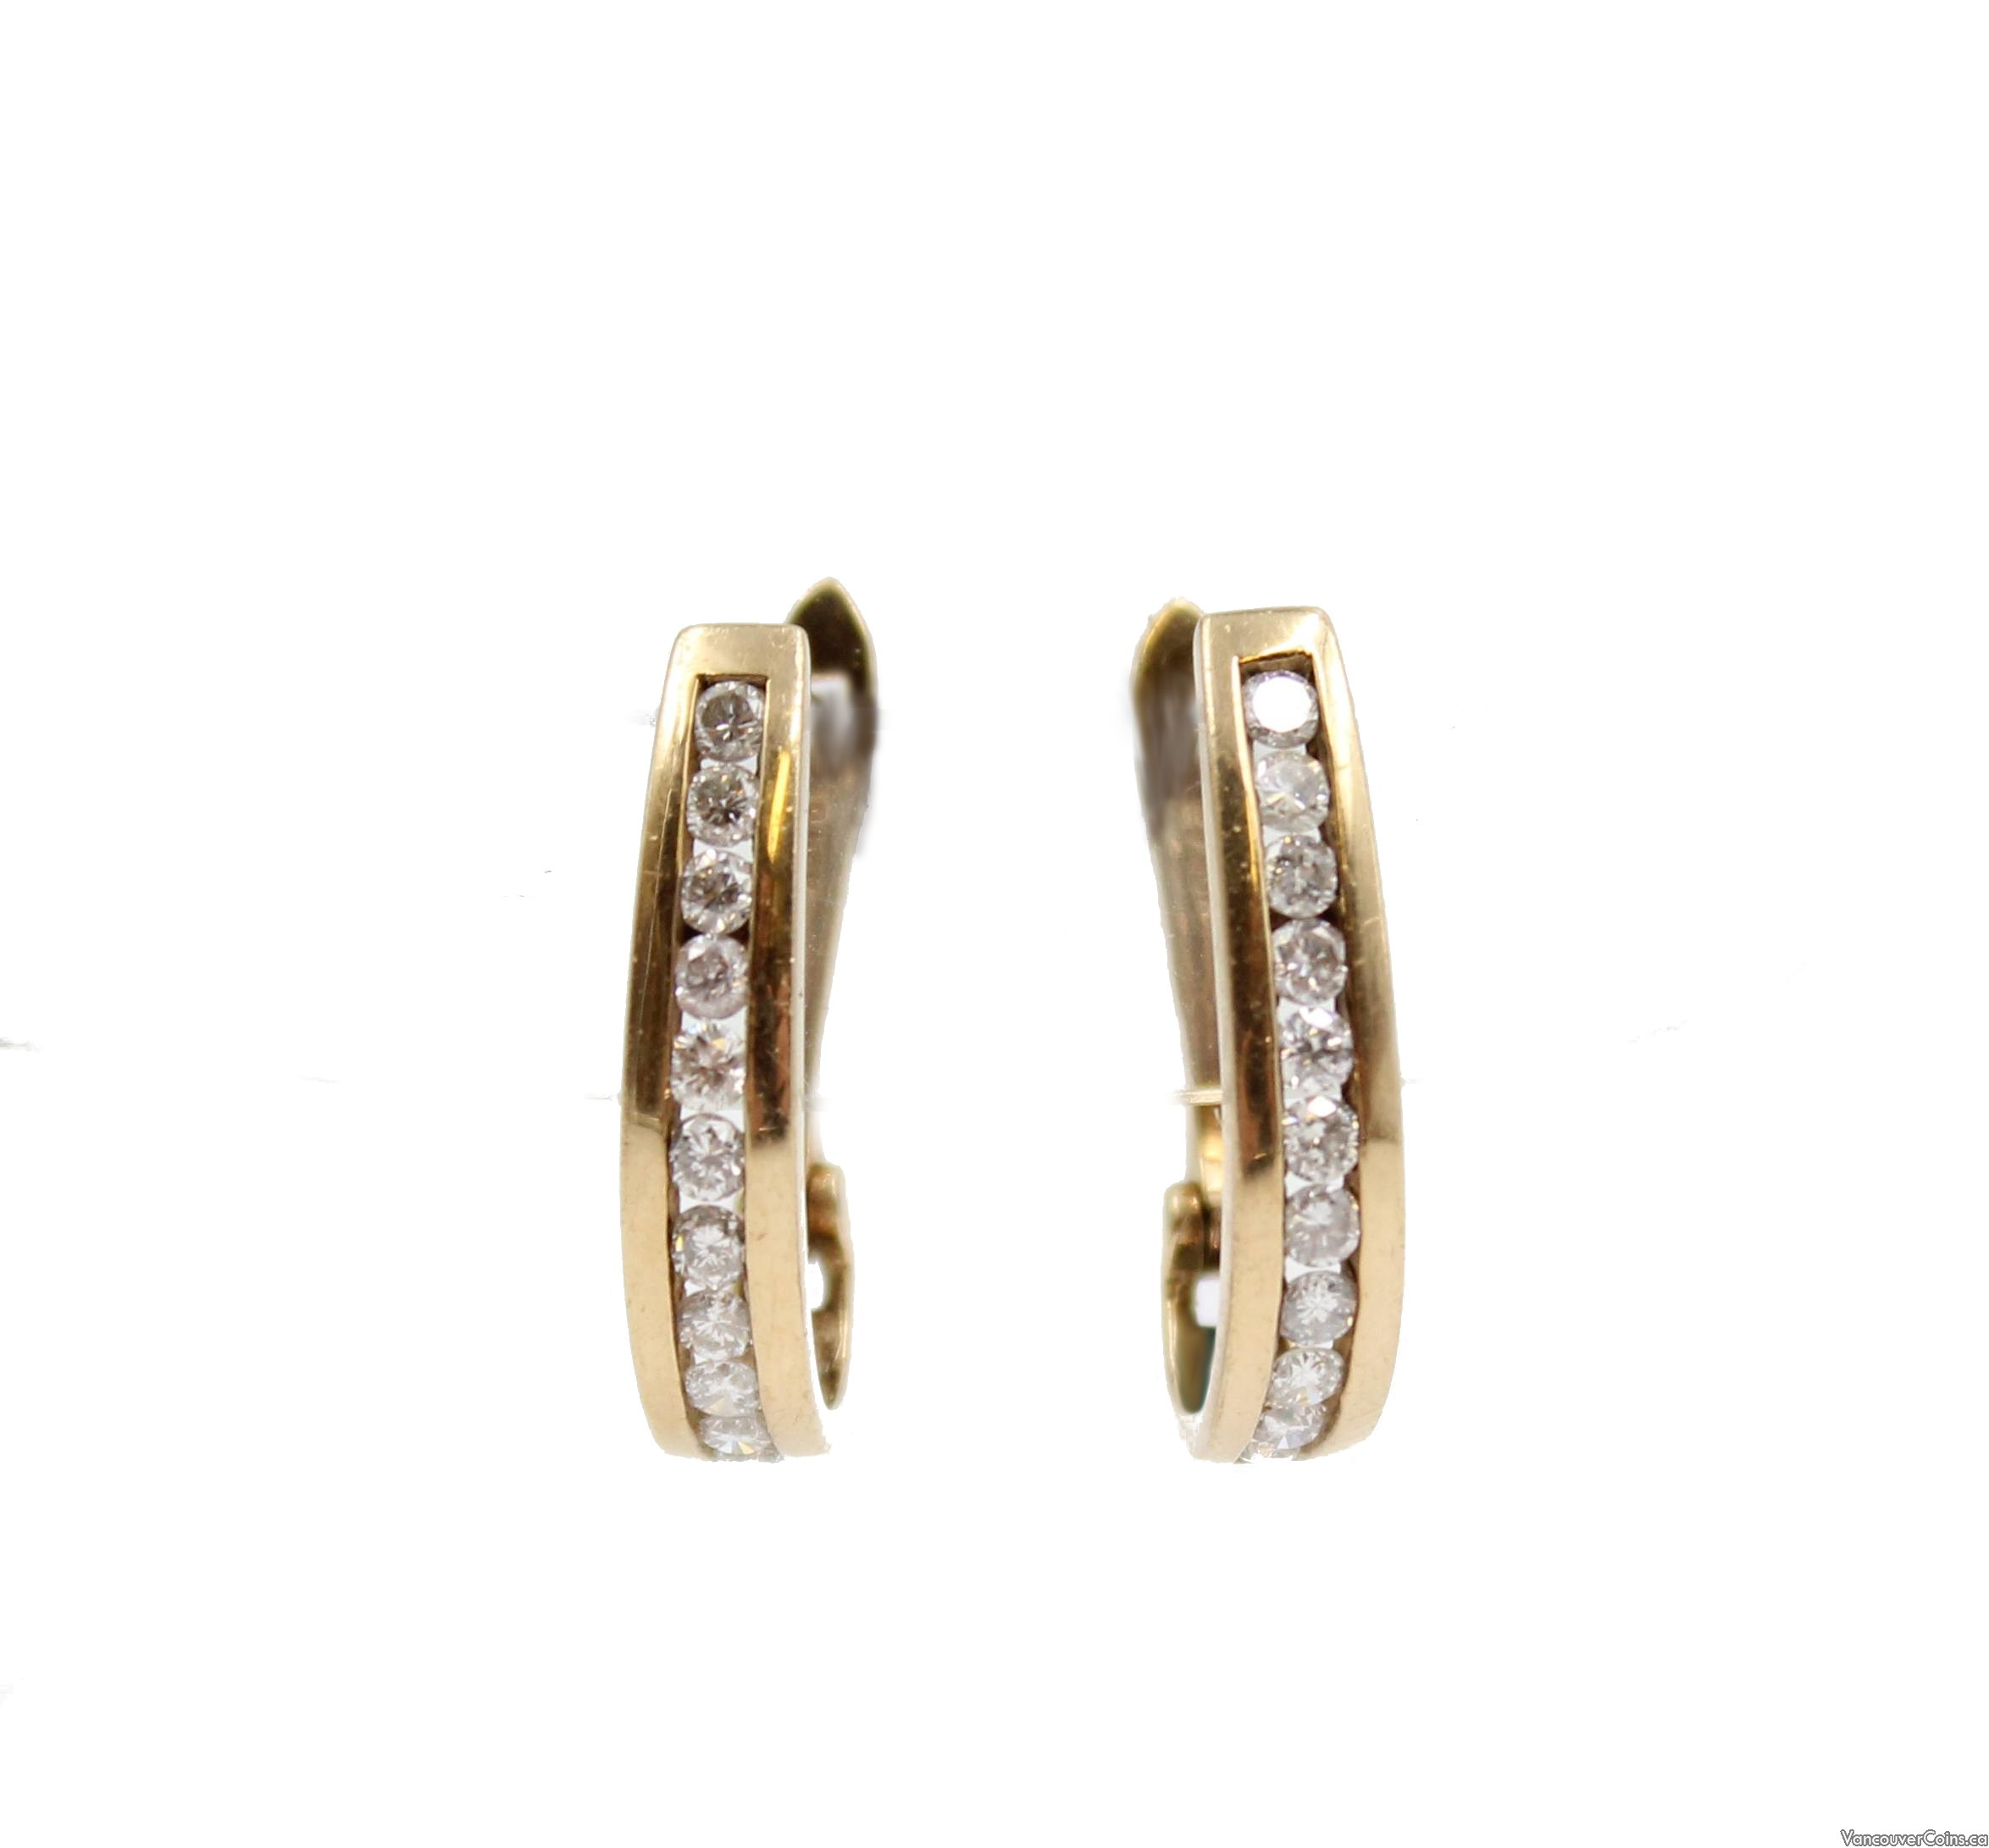 10 Karat Yellow Gold Ladies Diamond Leverback Earrings